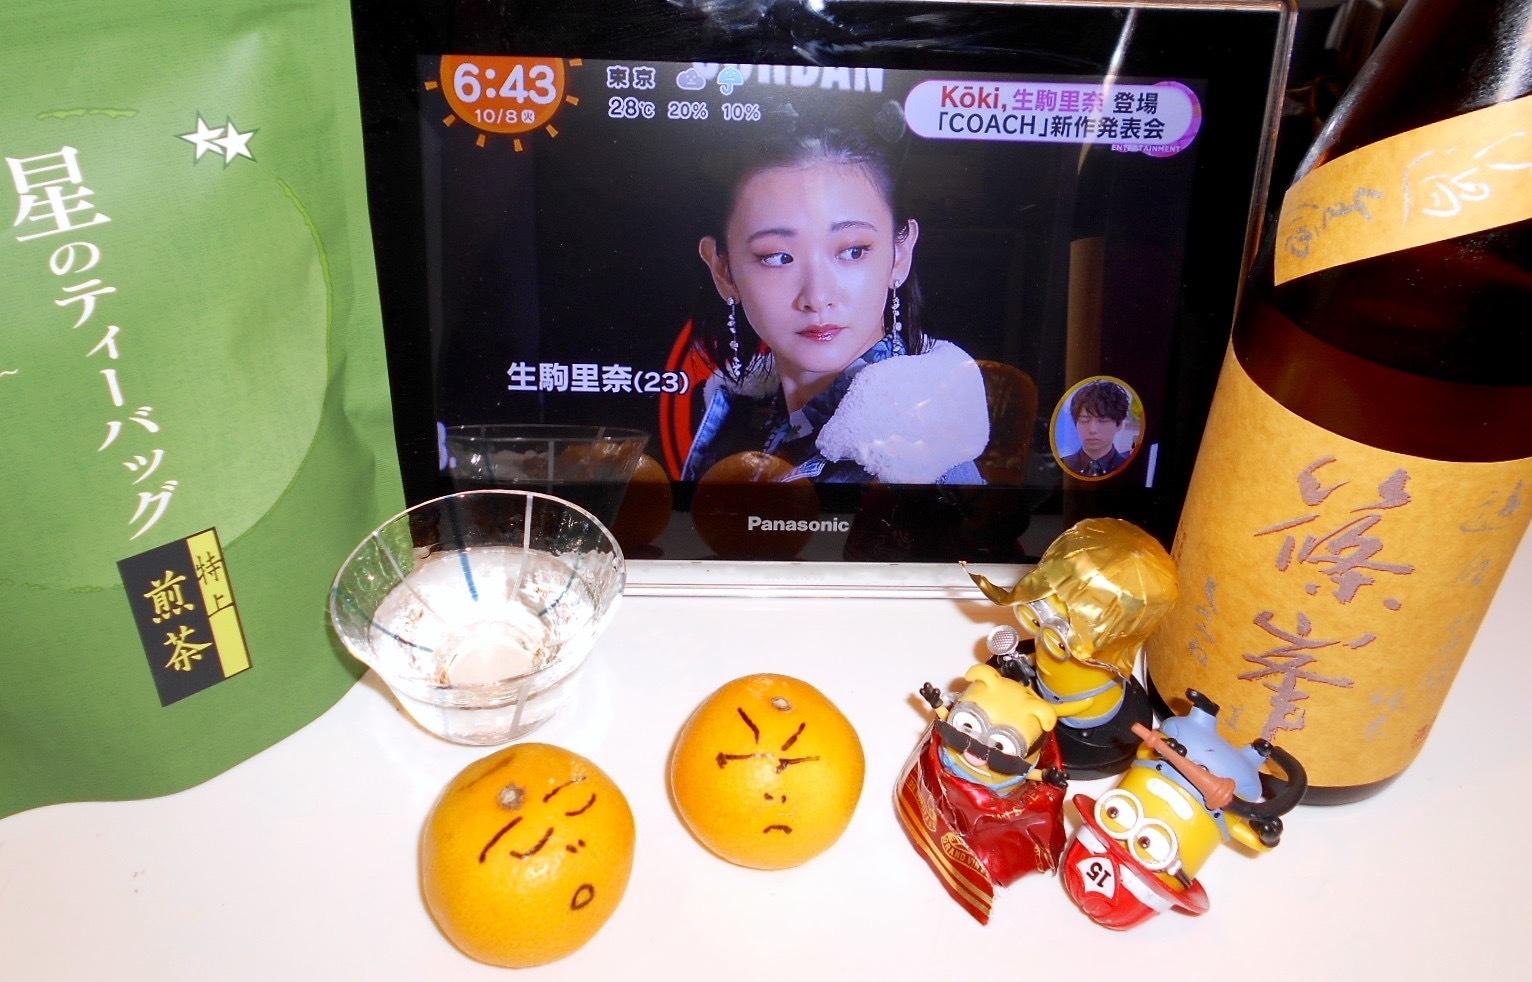 shihnomine_yuyu30by5.jpg